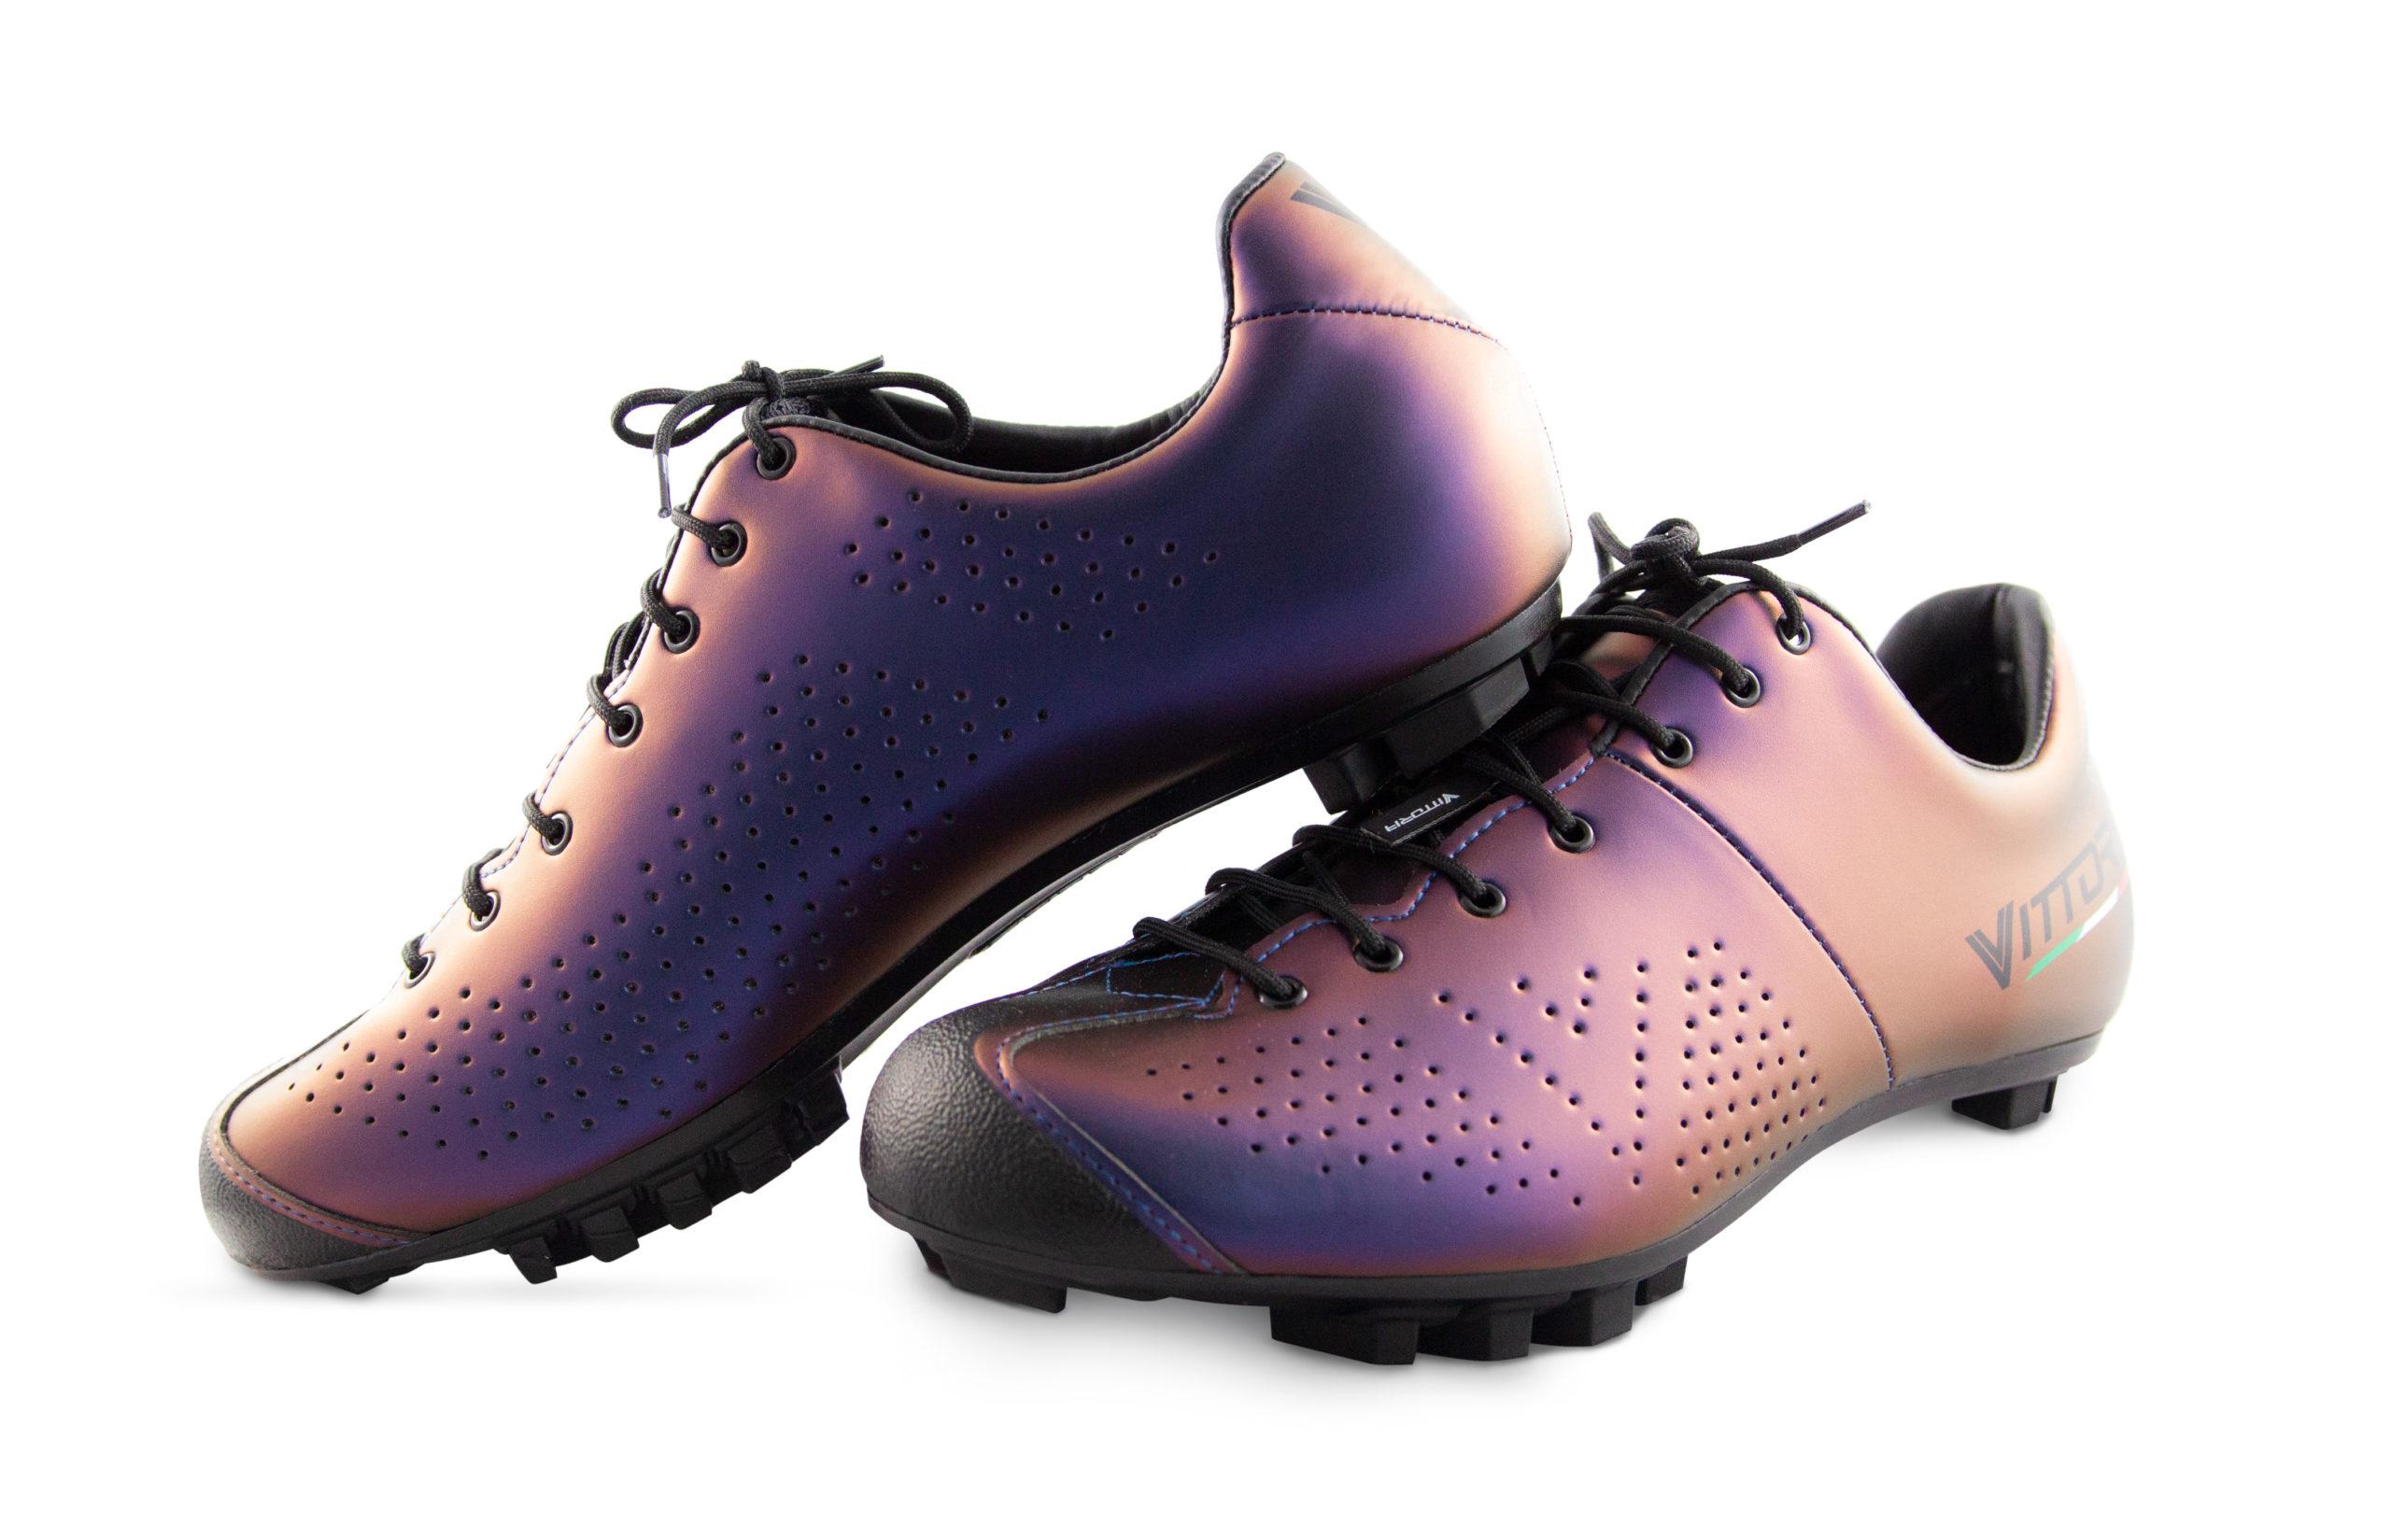 http://www.vittoria-shoes.com/det_news.php?id=30